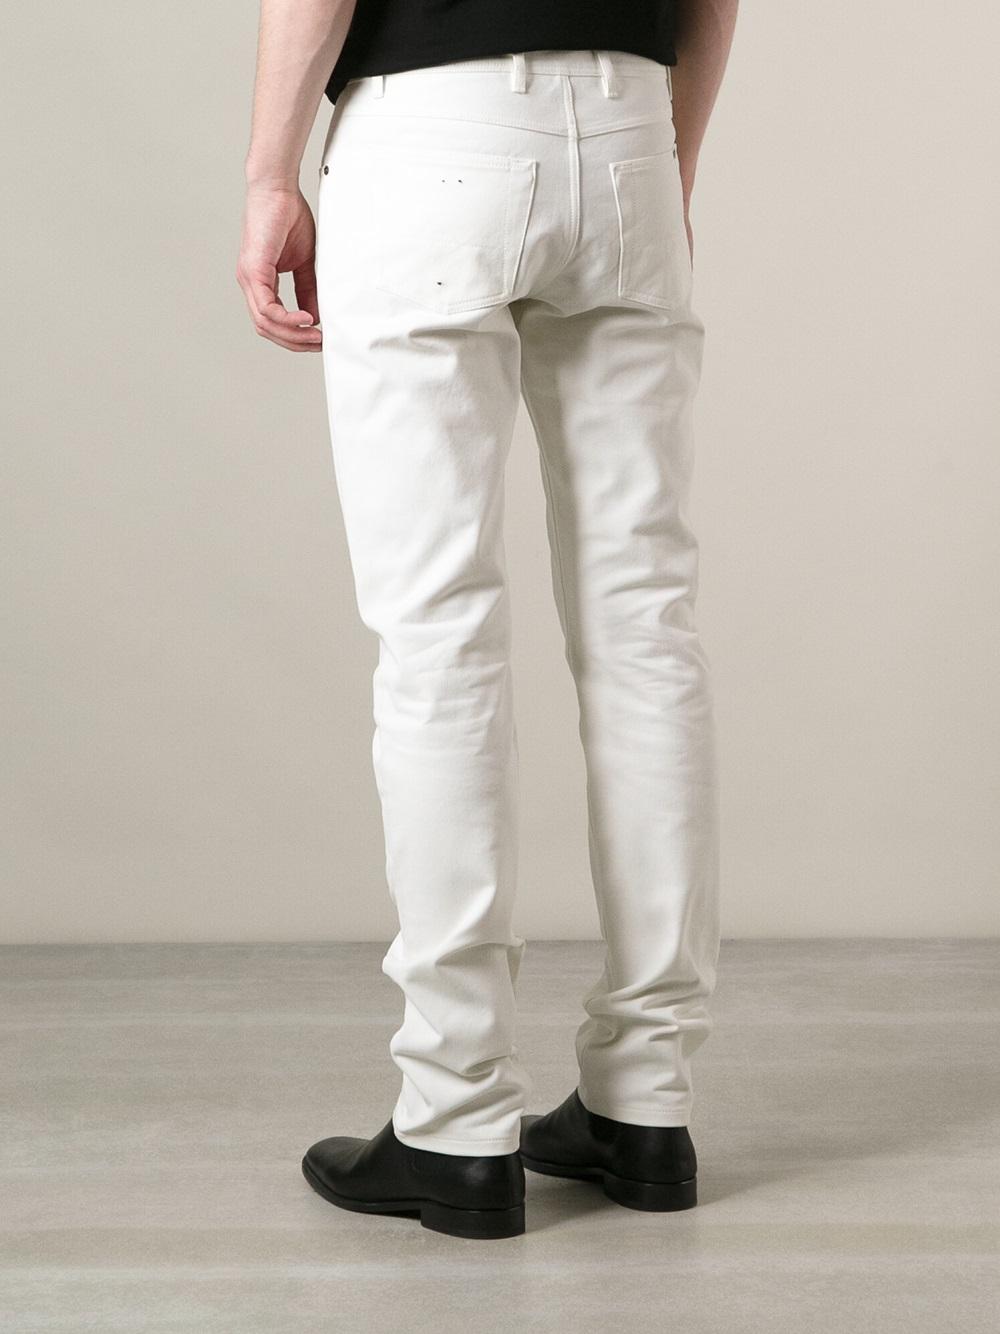 e56596ba6c0c2f Tom Ford Slim Fit Jeans in White for Men - Lyst